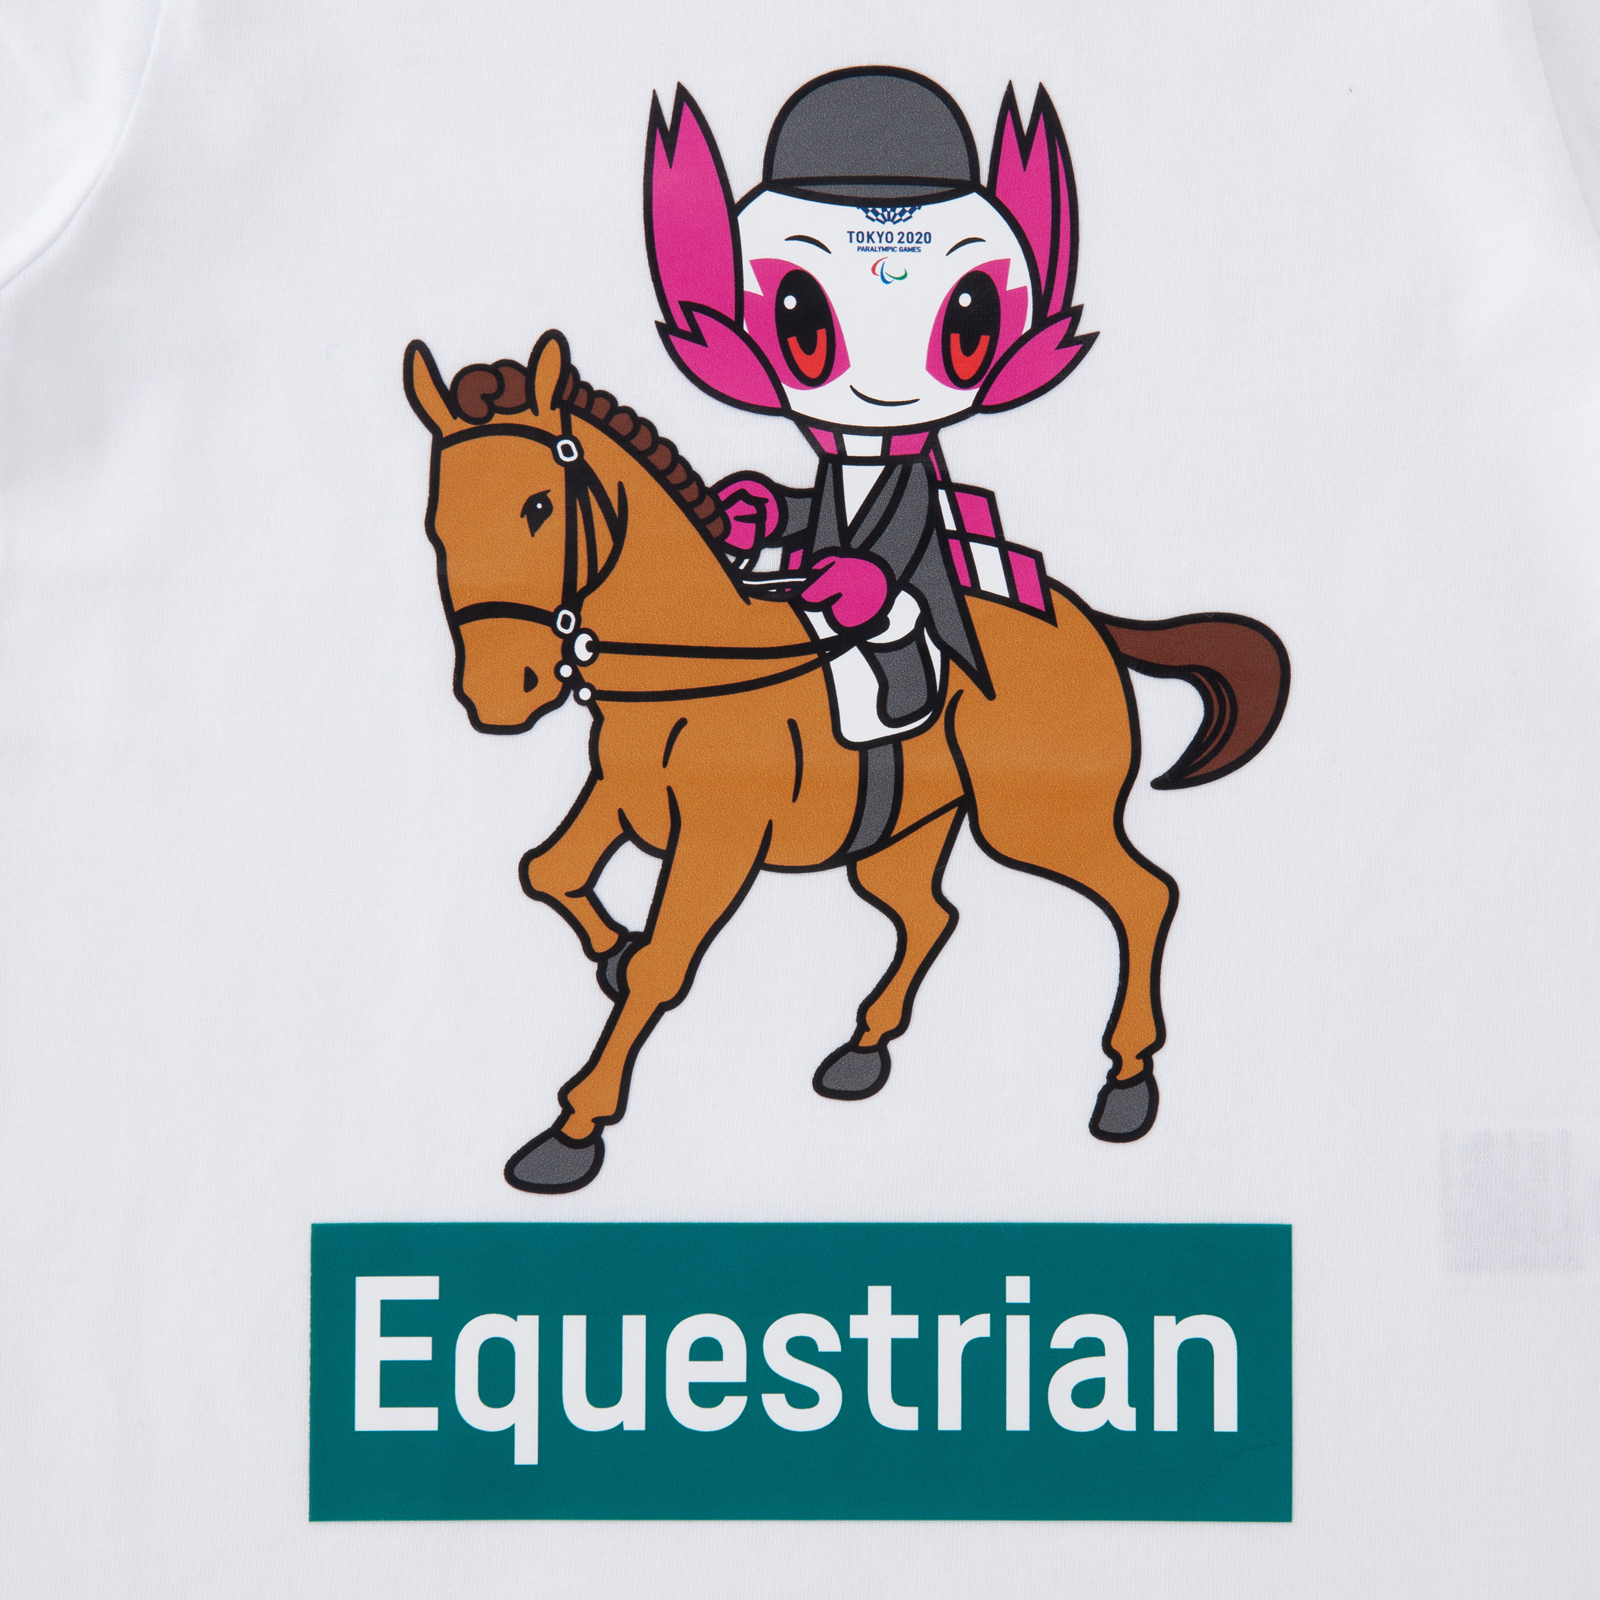 KIDSTシャツ馬術(東京2020パラリンピックマスコット)